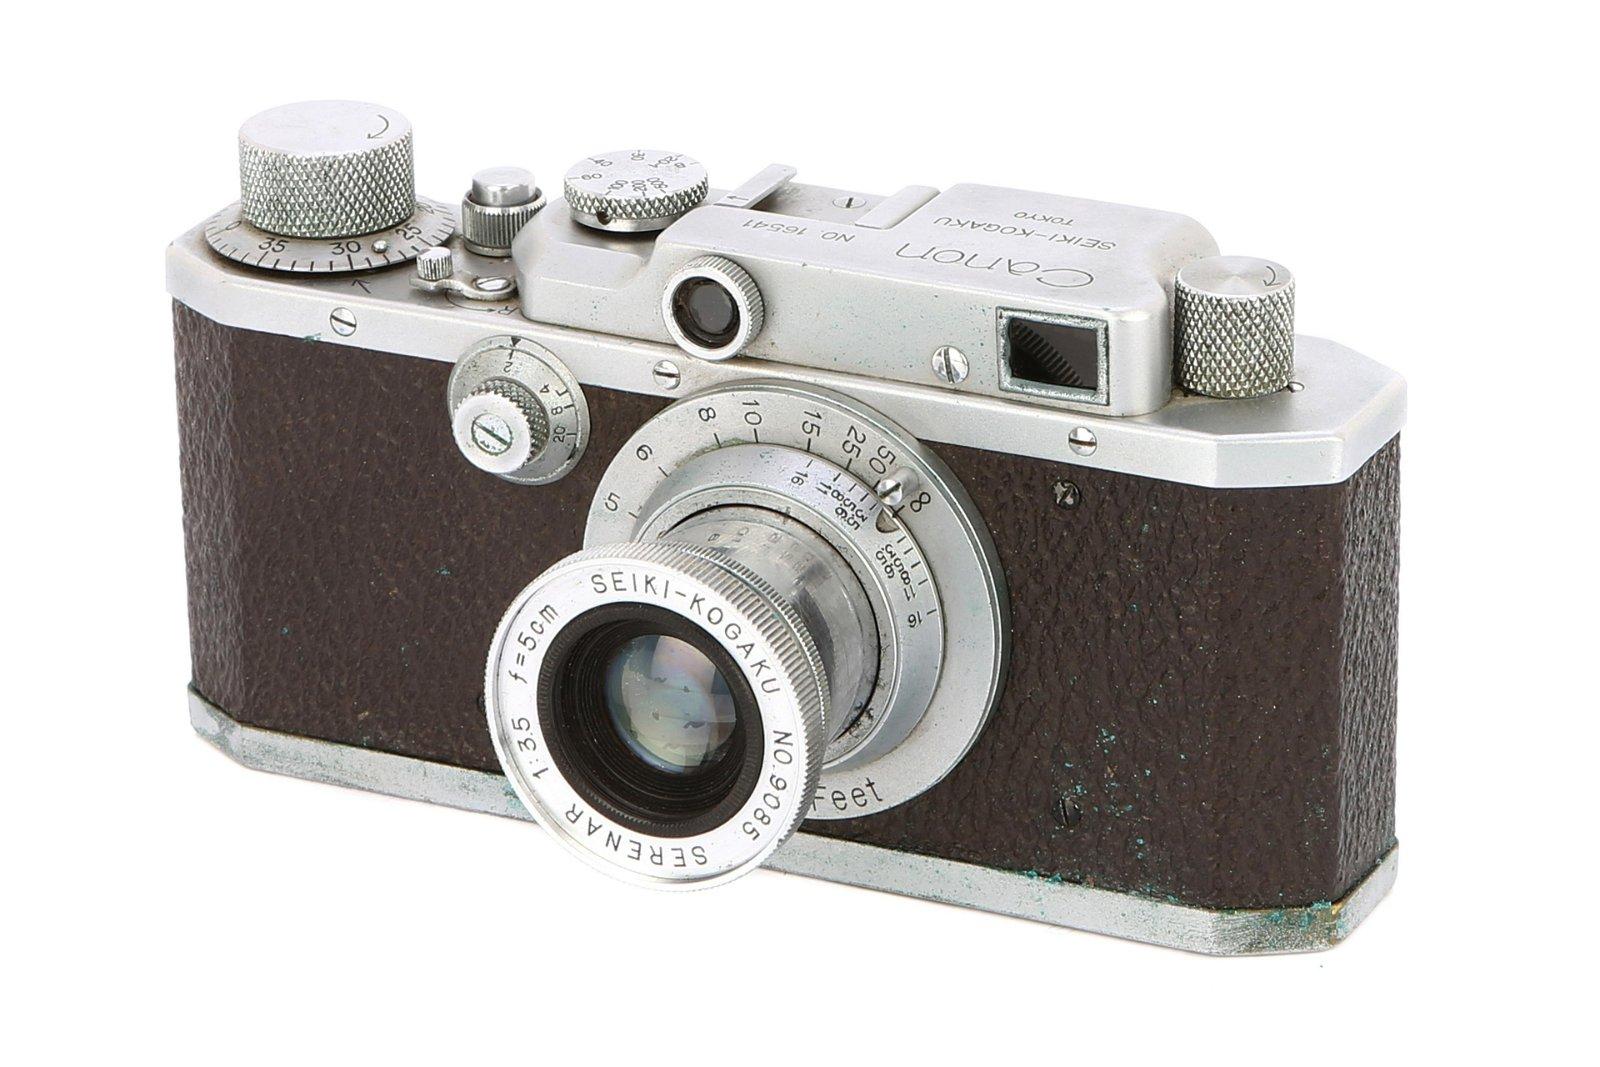 * A Canon S-II Seiki Kogaku Rangefinder Camera,